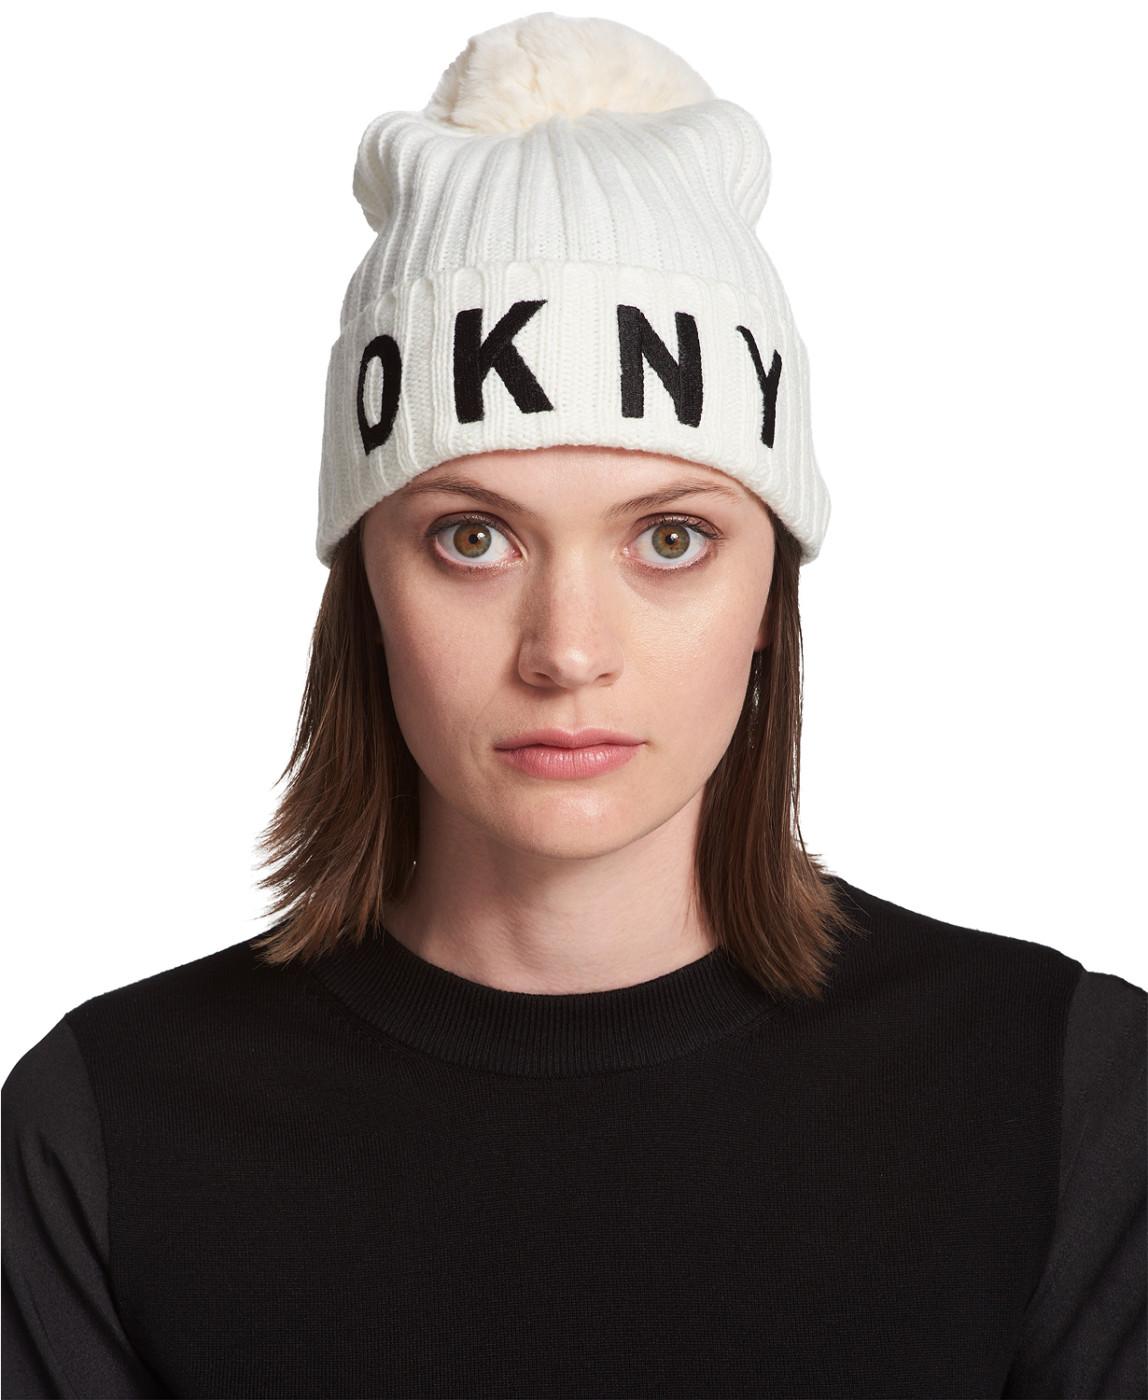 702c4677c DKNY Women's White Ribbed Knit Pom Pom Logo Beanie Hat